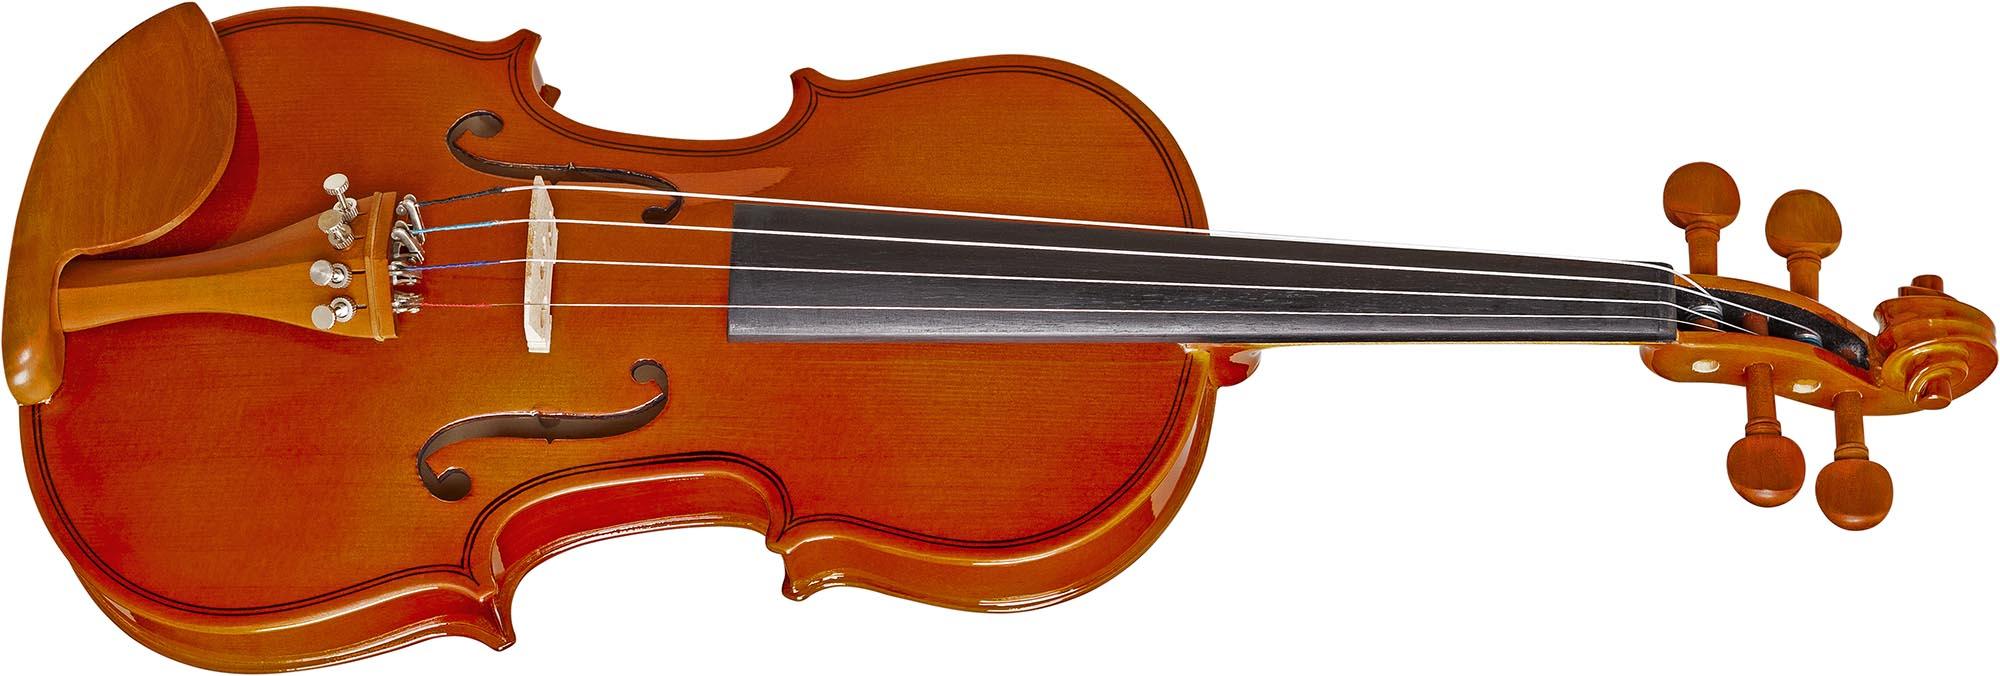 hve241 violino hofma hve241 visao frontal